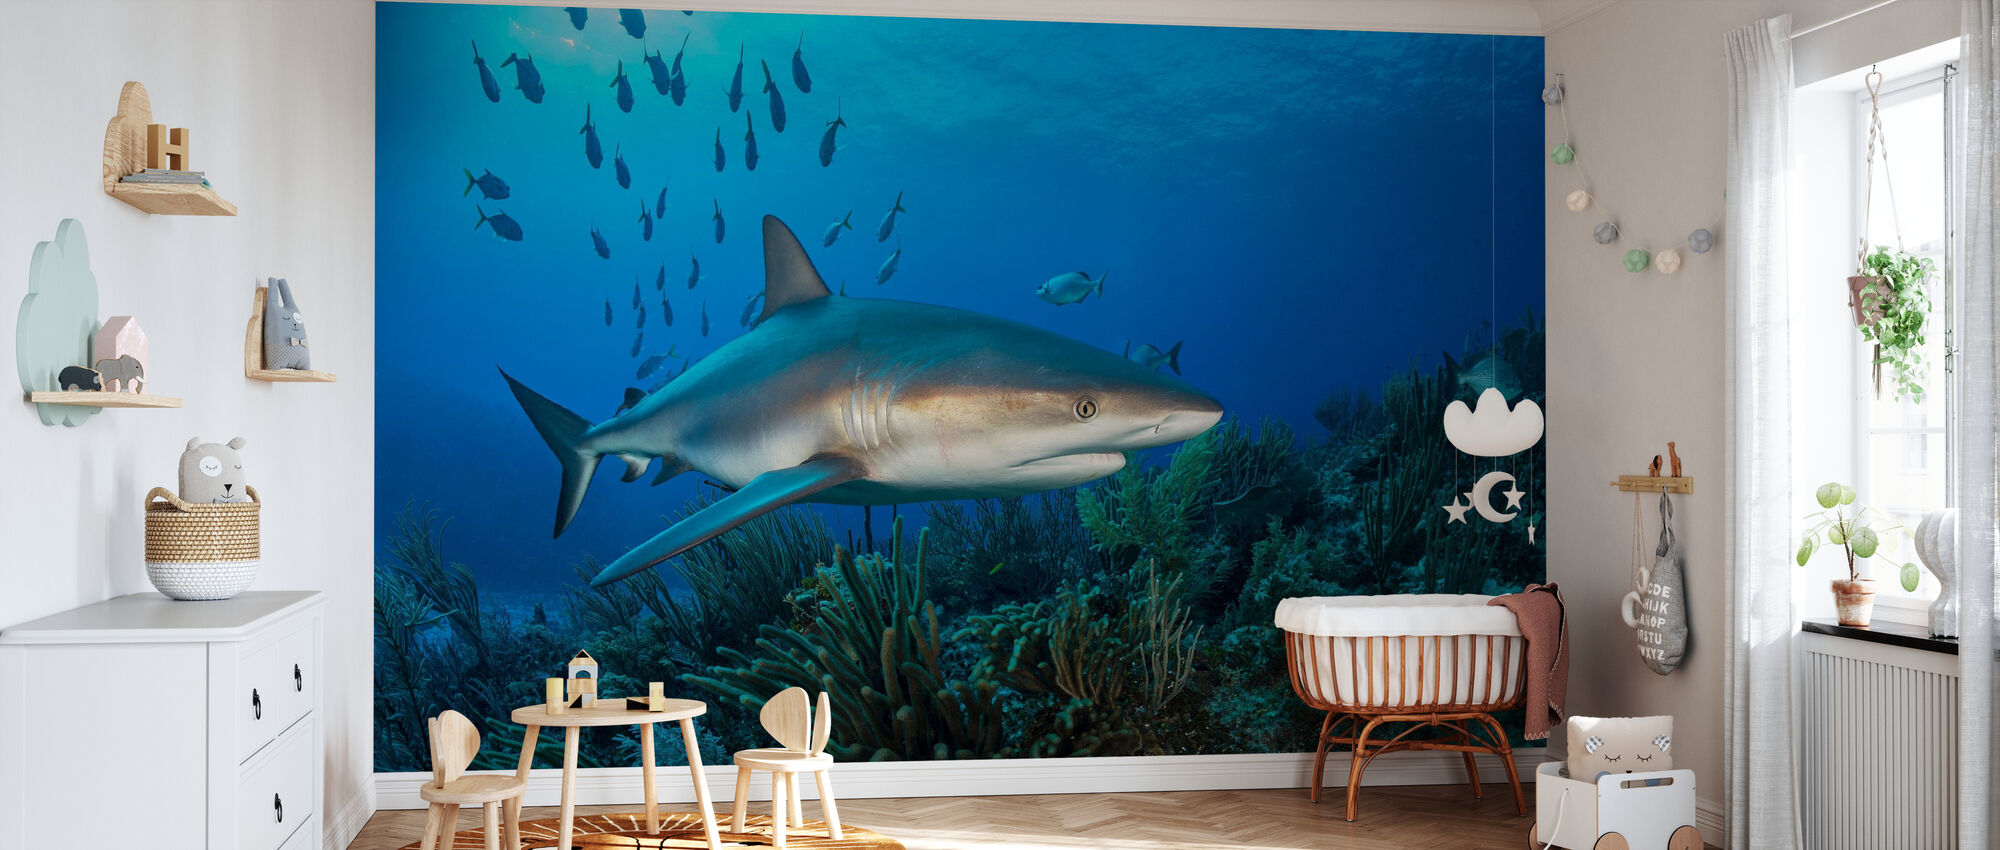 Caribbean Reef Shark - Wallpaper - Nursery